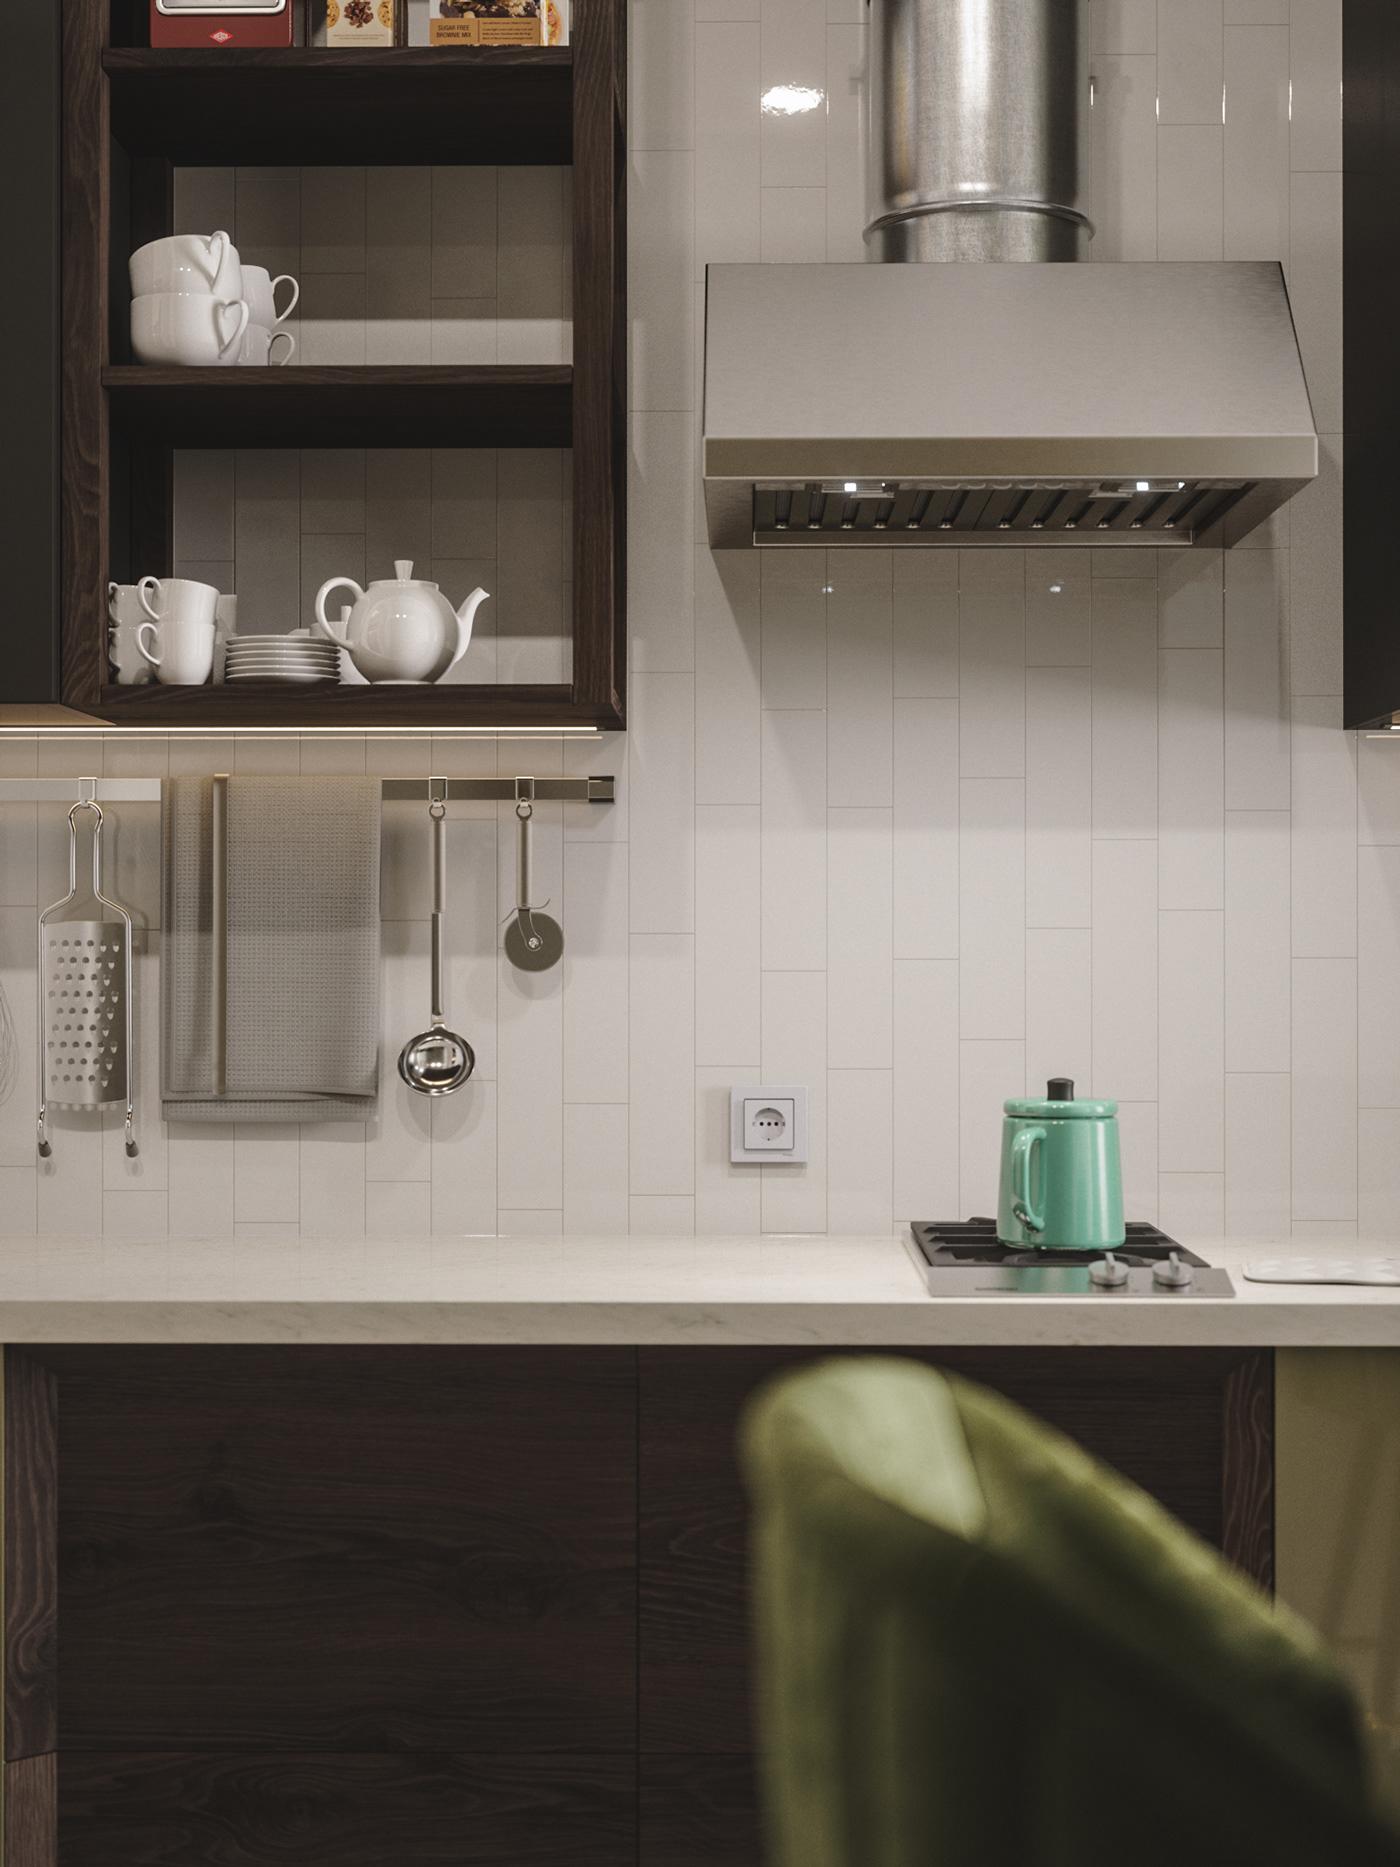 3ds max archviz FStorm green high-gloss kitchen Render